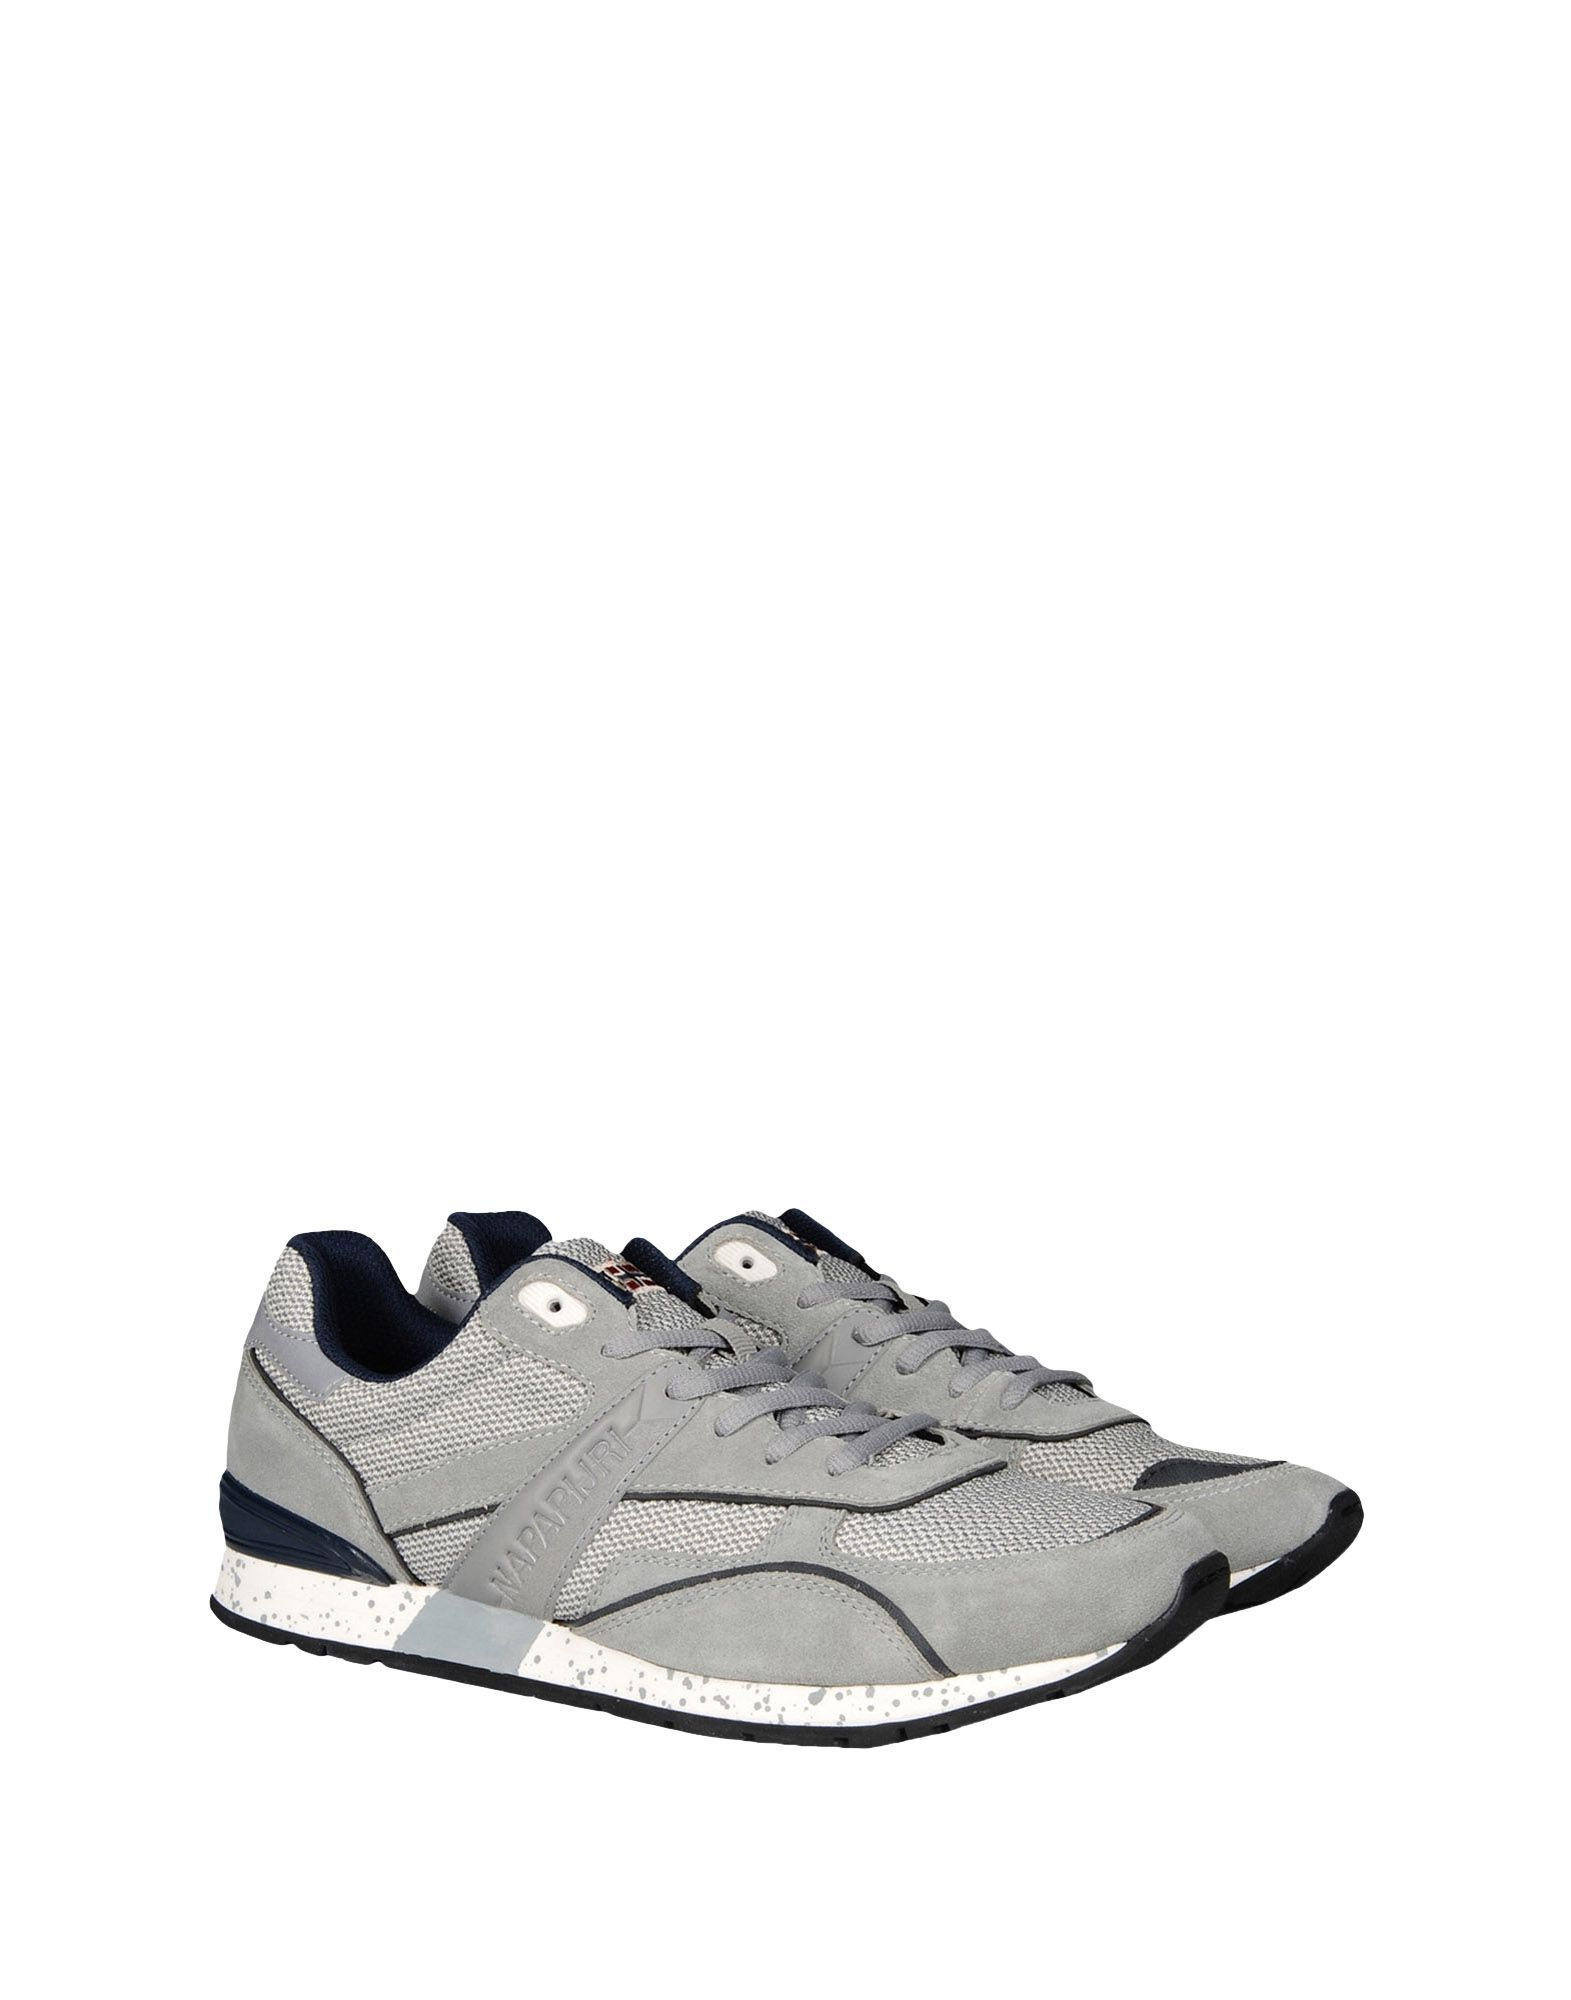 Sneakers Napapijri Uomo - 11306468UD elegante